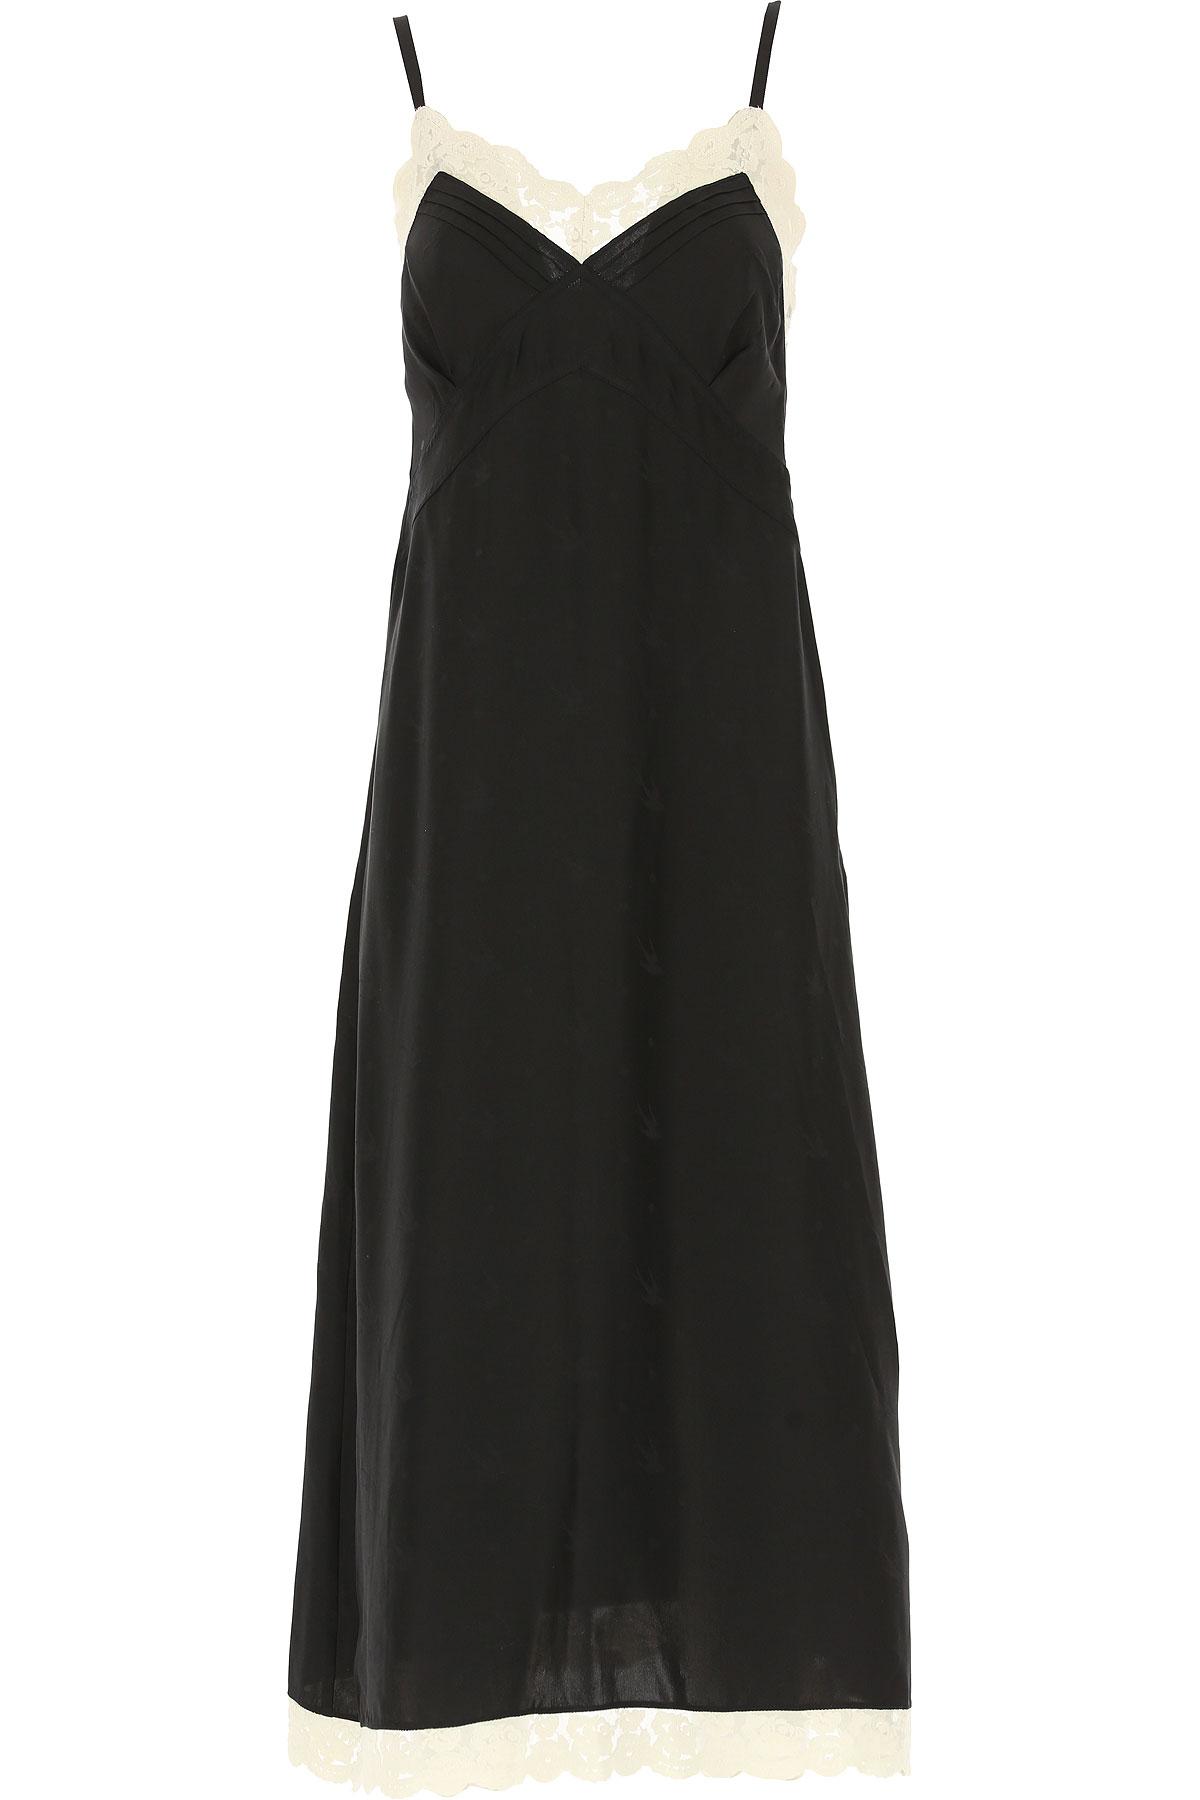 Image of Alexander McQueen McQ Dress for Women, Evening Cocktail Party, Black, Silk, 2017, UK 8 - US 6 - EU 40 UK 10 - US 8 - EU 42